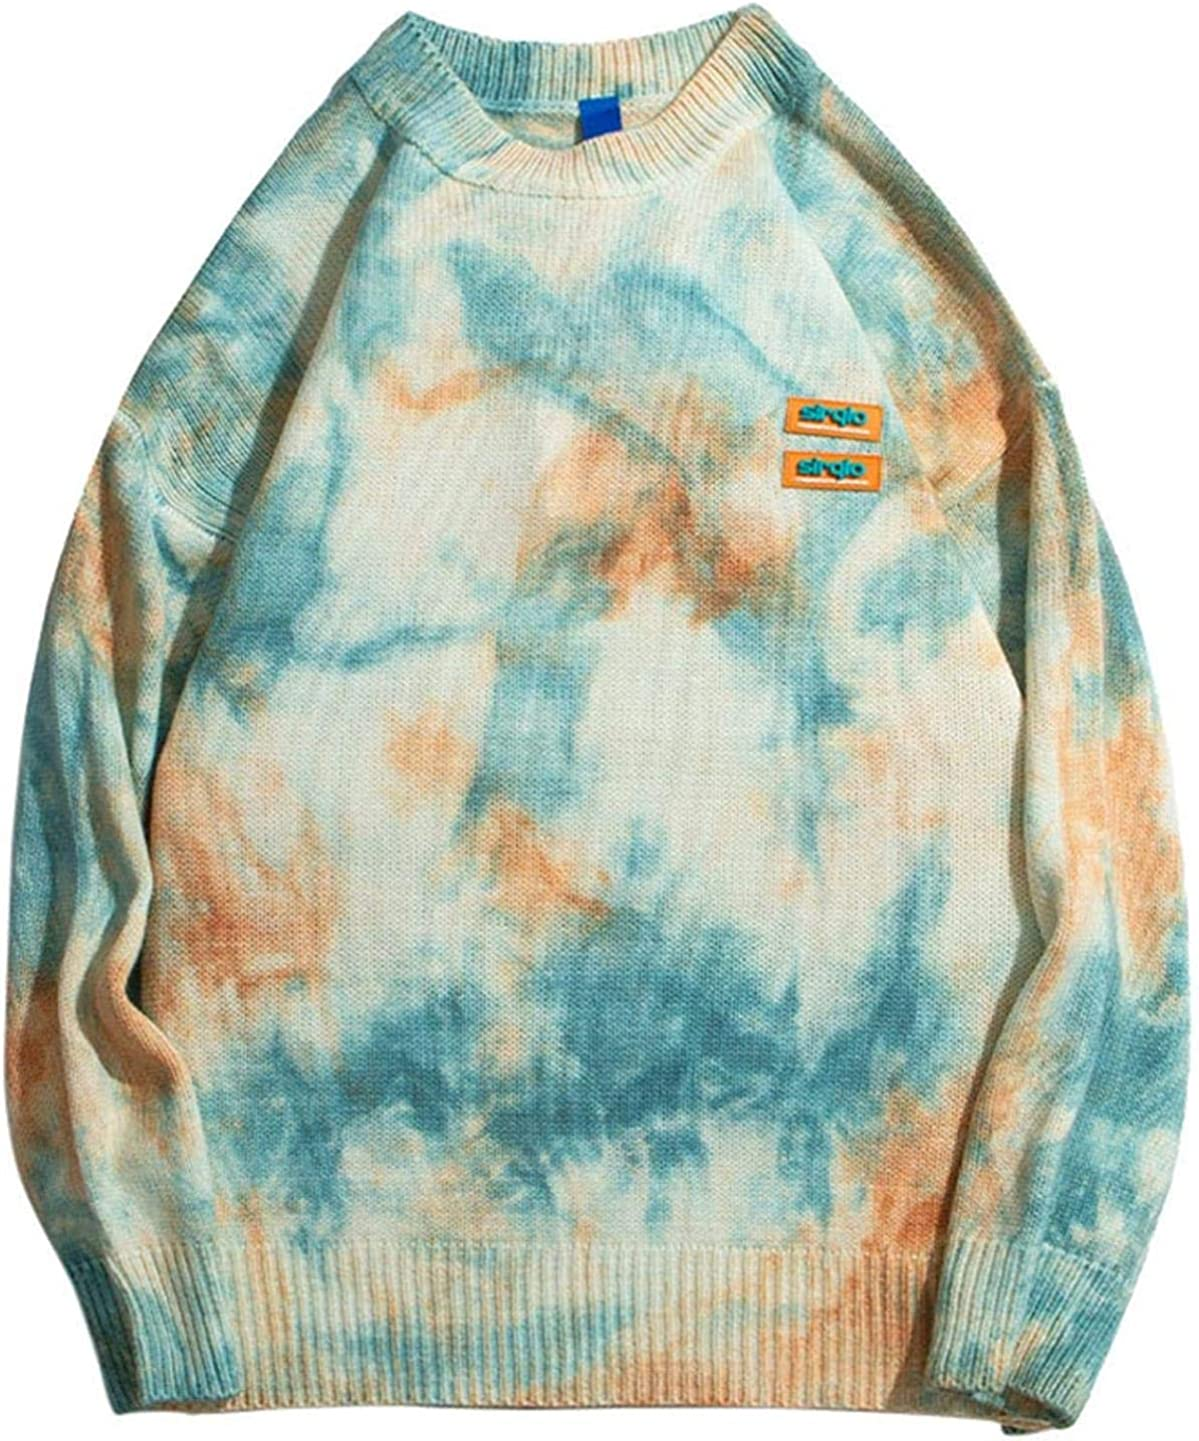 WSBD Men Knitted Jumper Pull Sweaters Tie Dye Design Streetwear Fashion Casual Pullovers